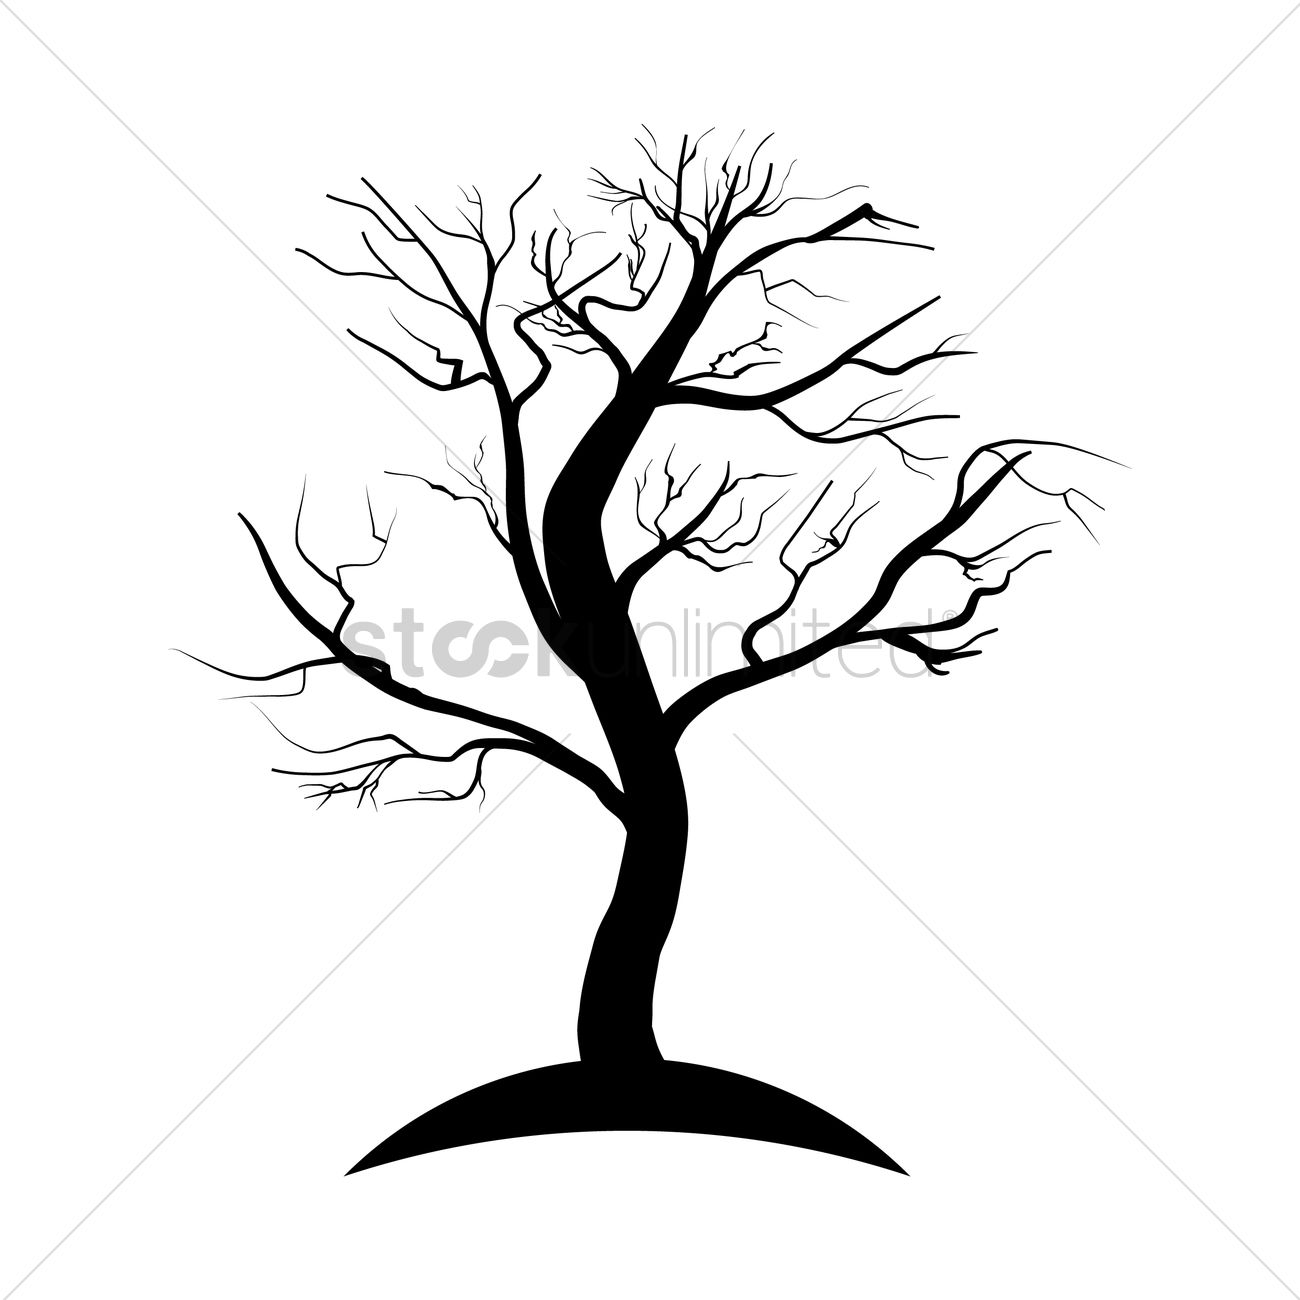 1300x1300 Dead Tree Silhouette Vector Image